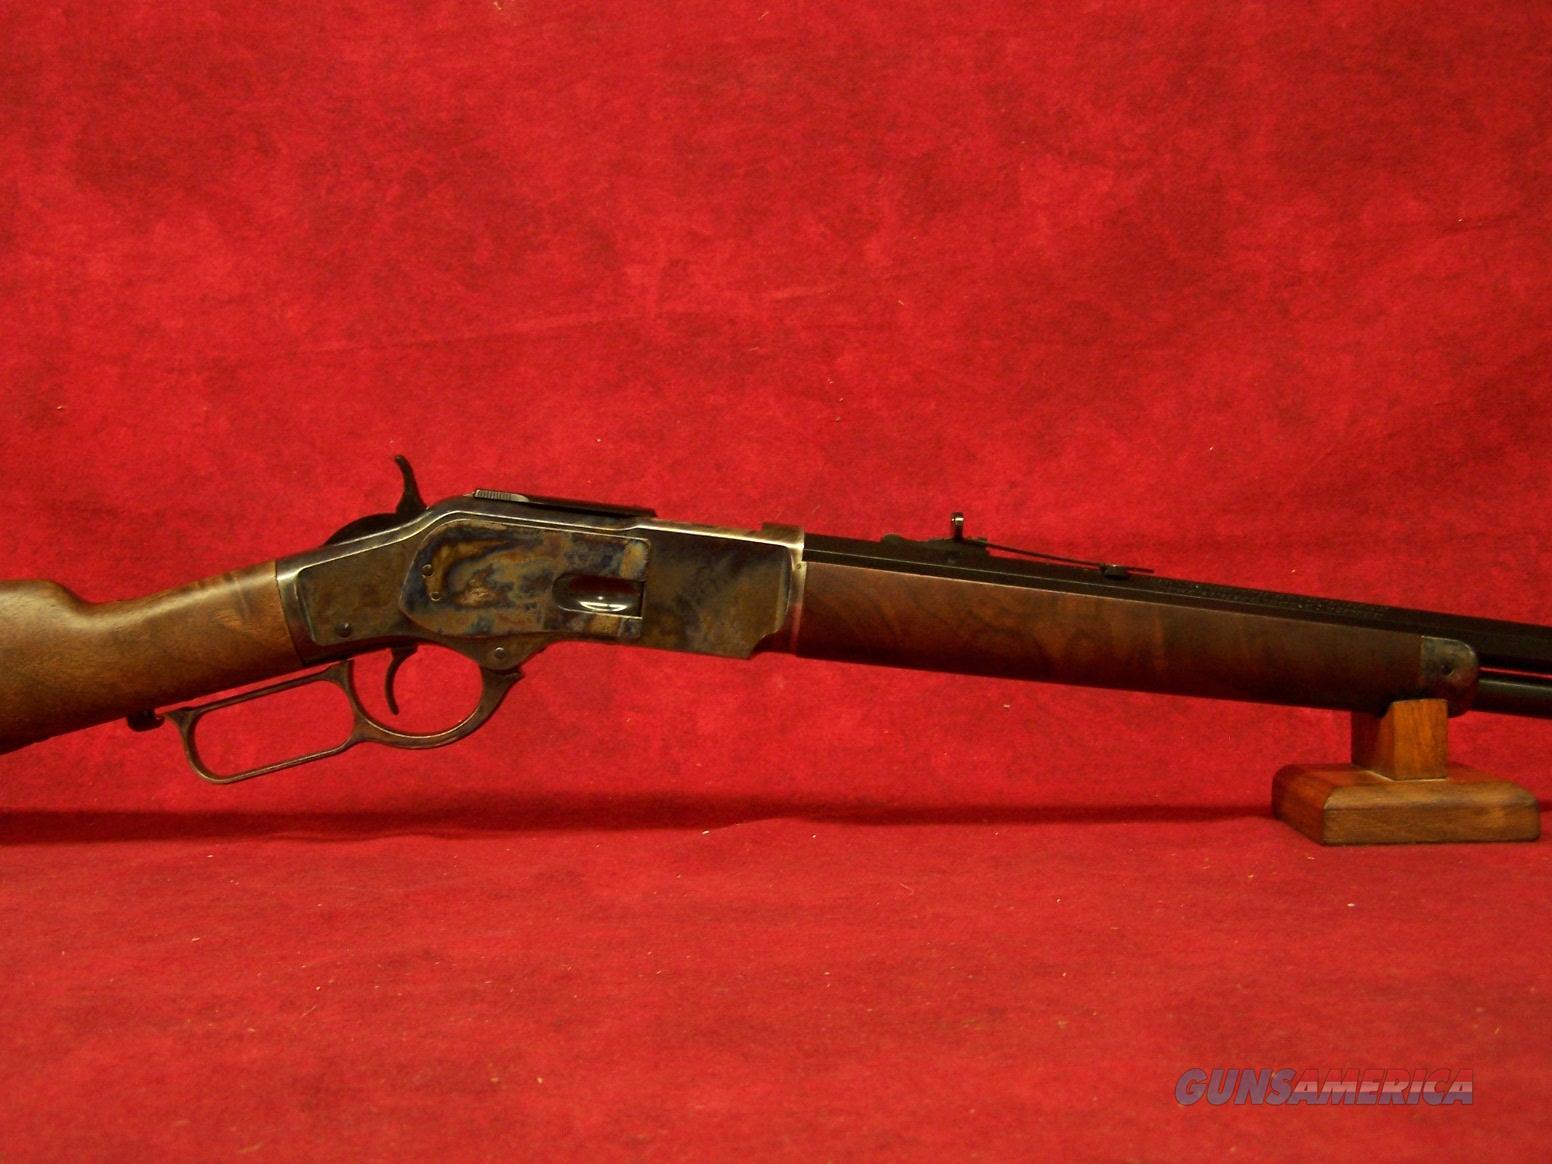 "Winchester 1873 Sporter 357 Mag/38 Spl 24"" Barrel (534217137)  Guns > Rifles > Winchester Rifles - Modern Lever > Other Lever > Post-64"